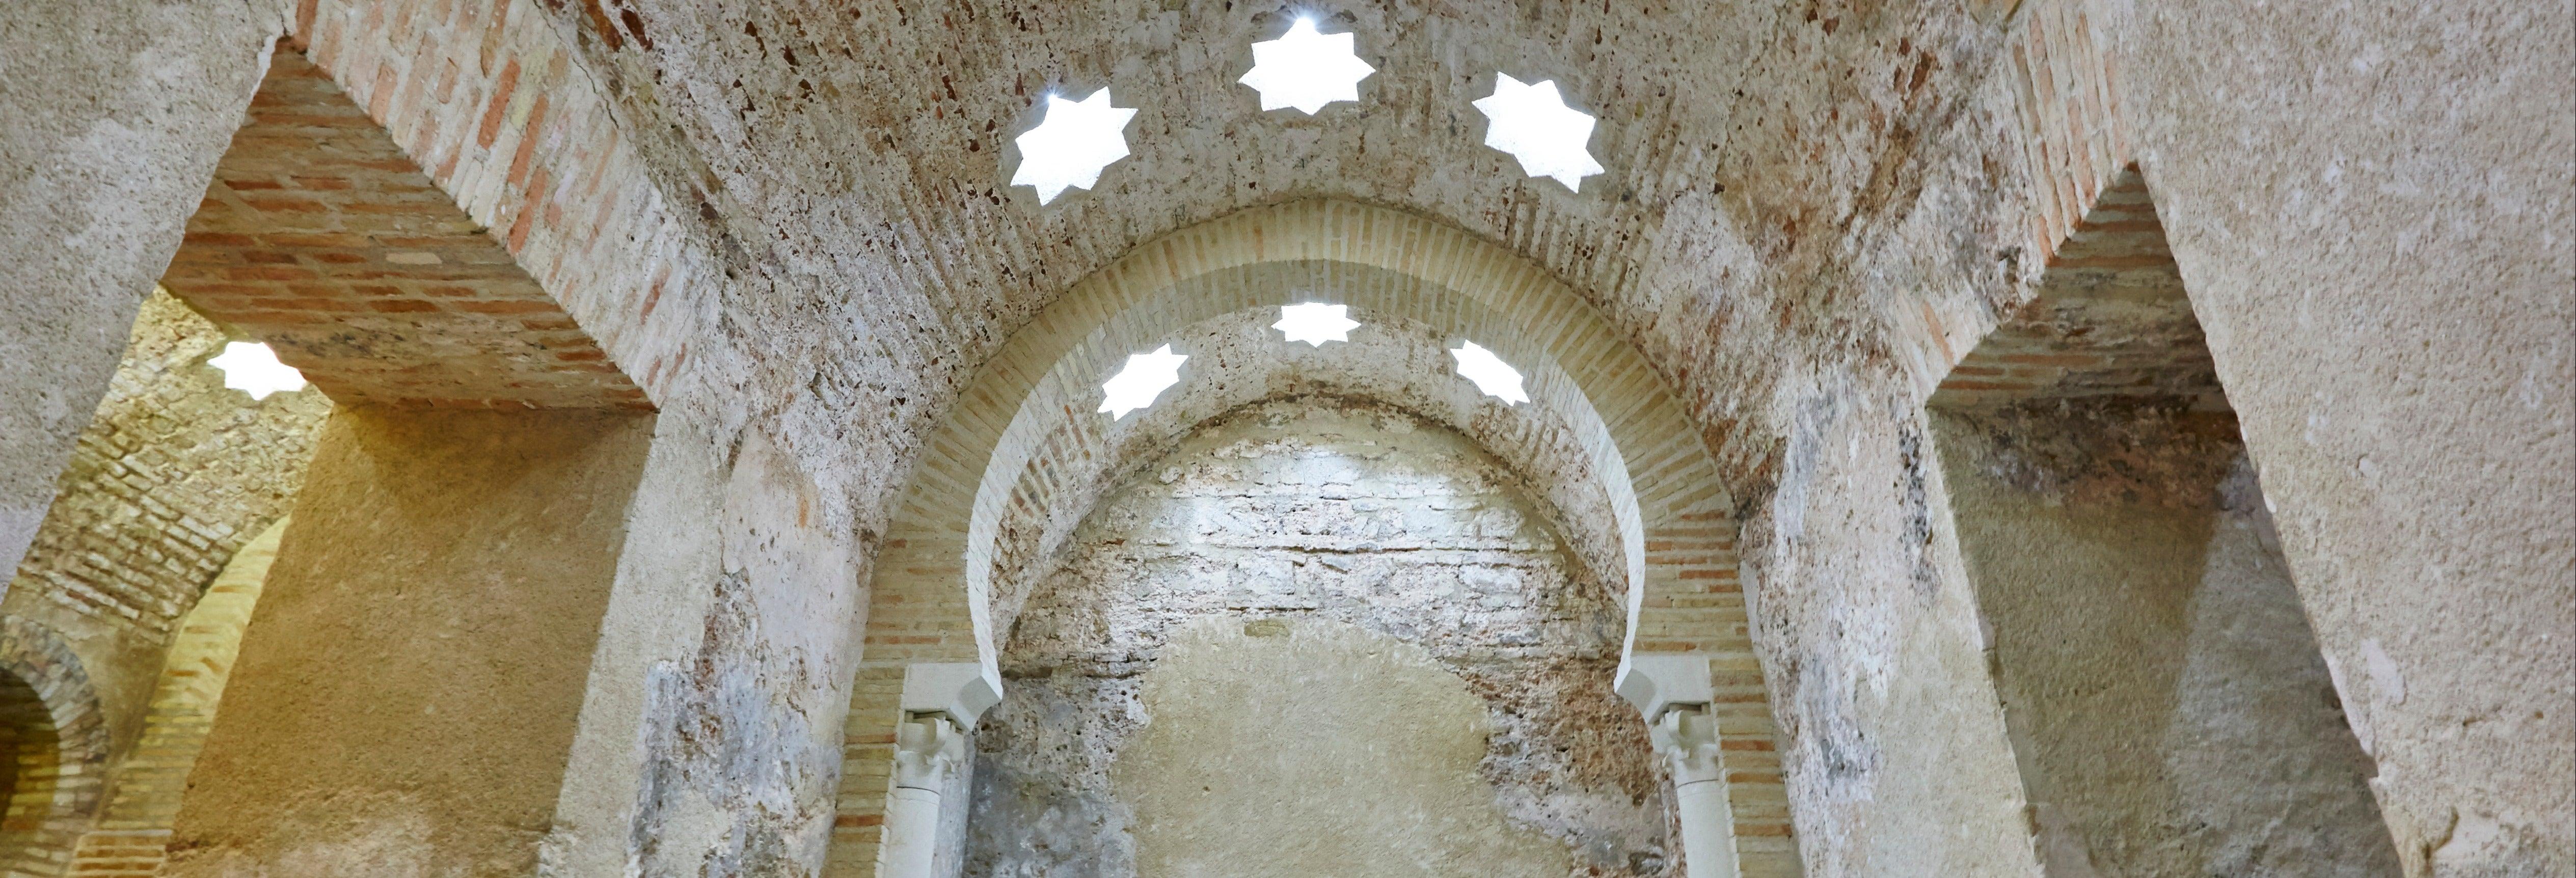 Bains Arabes et Palais Villardompardo